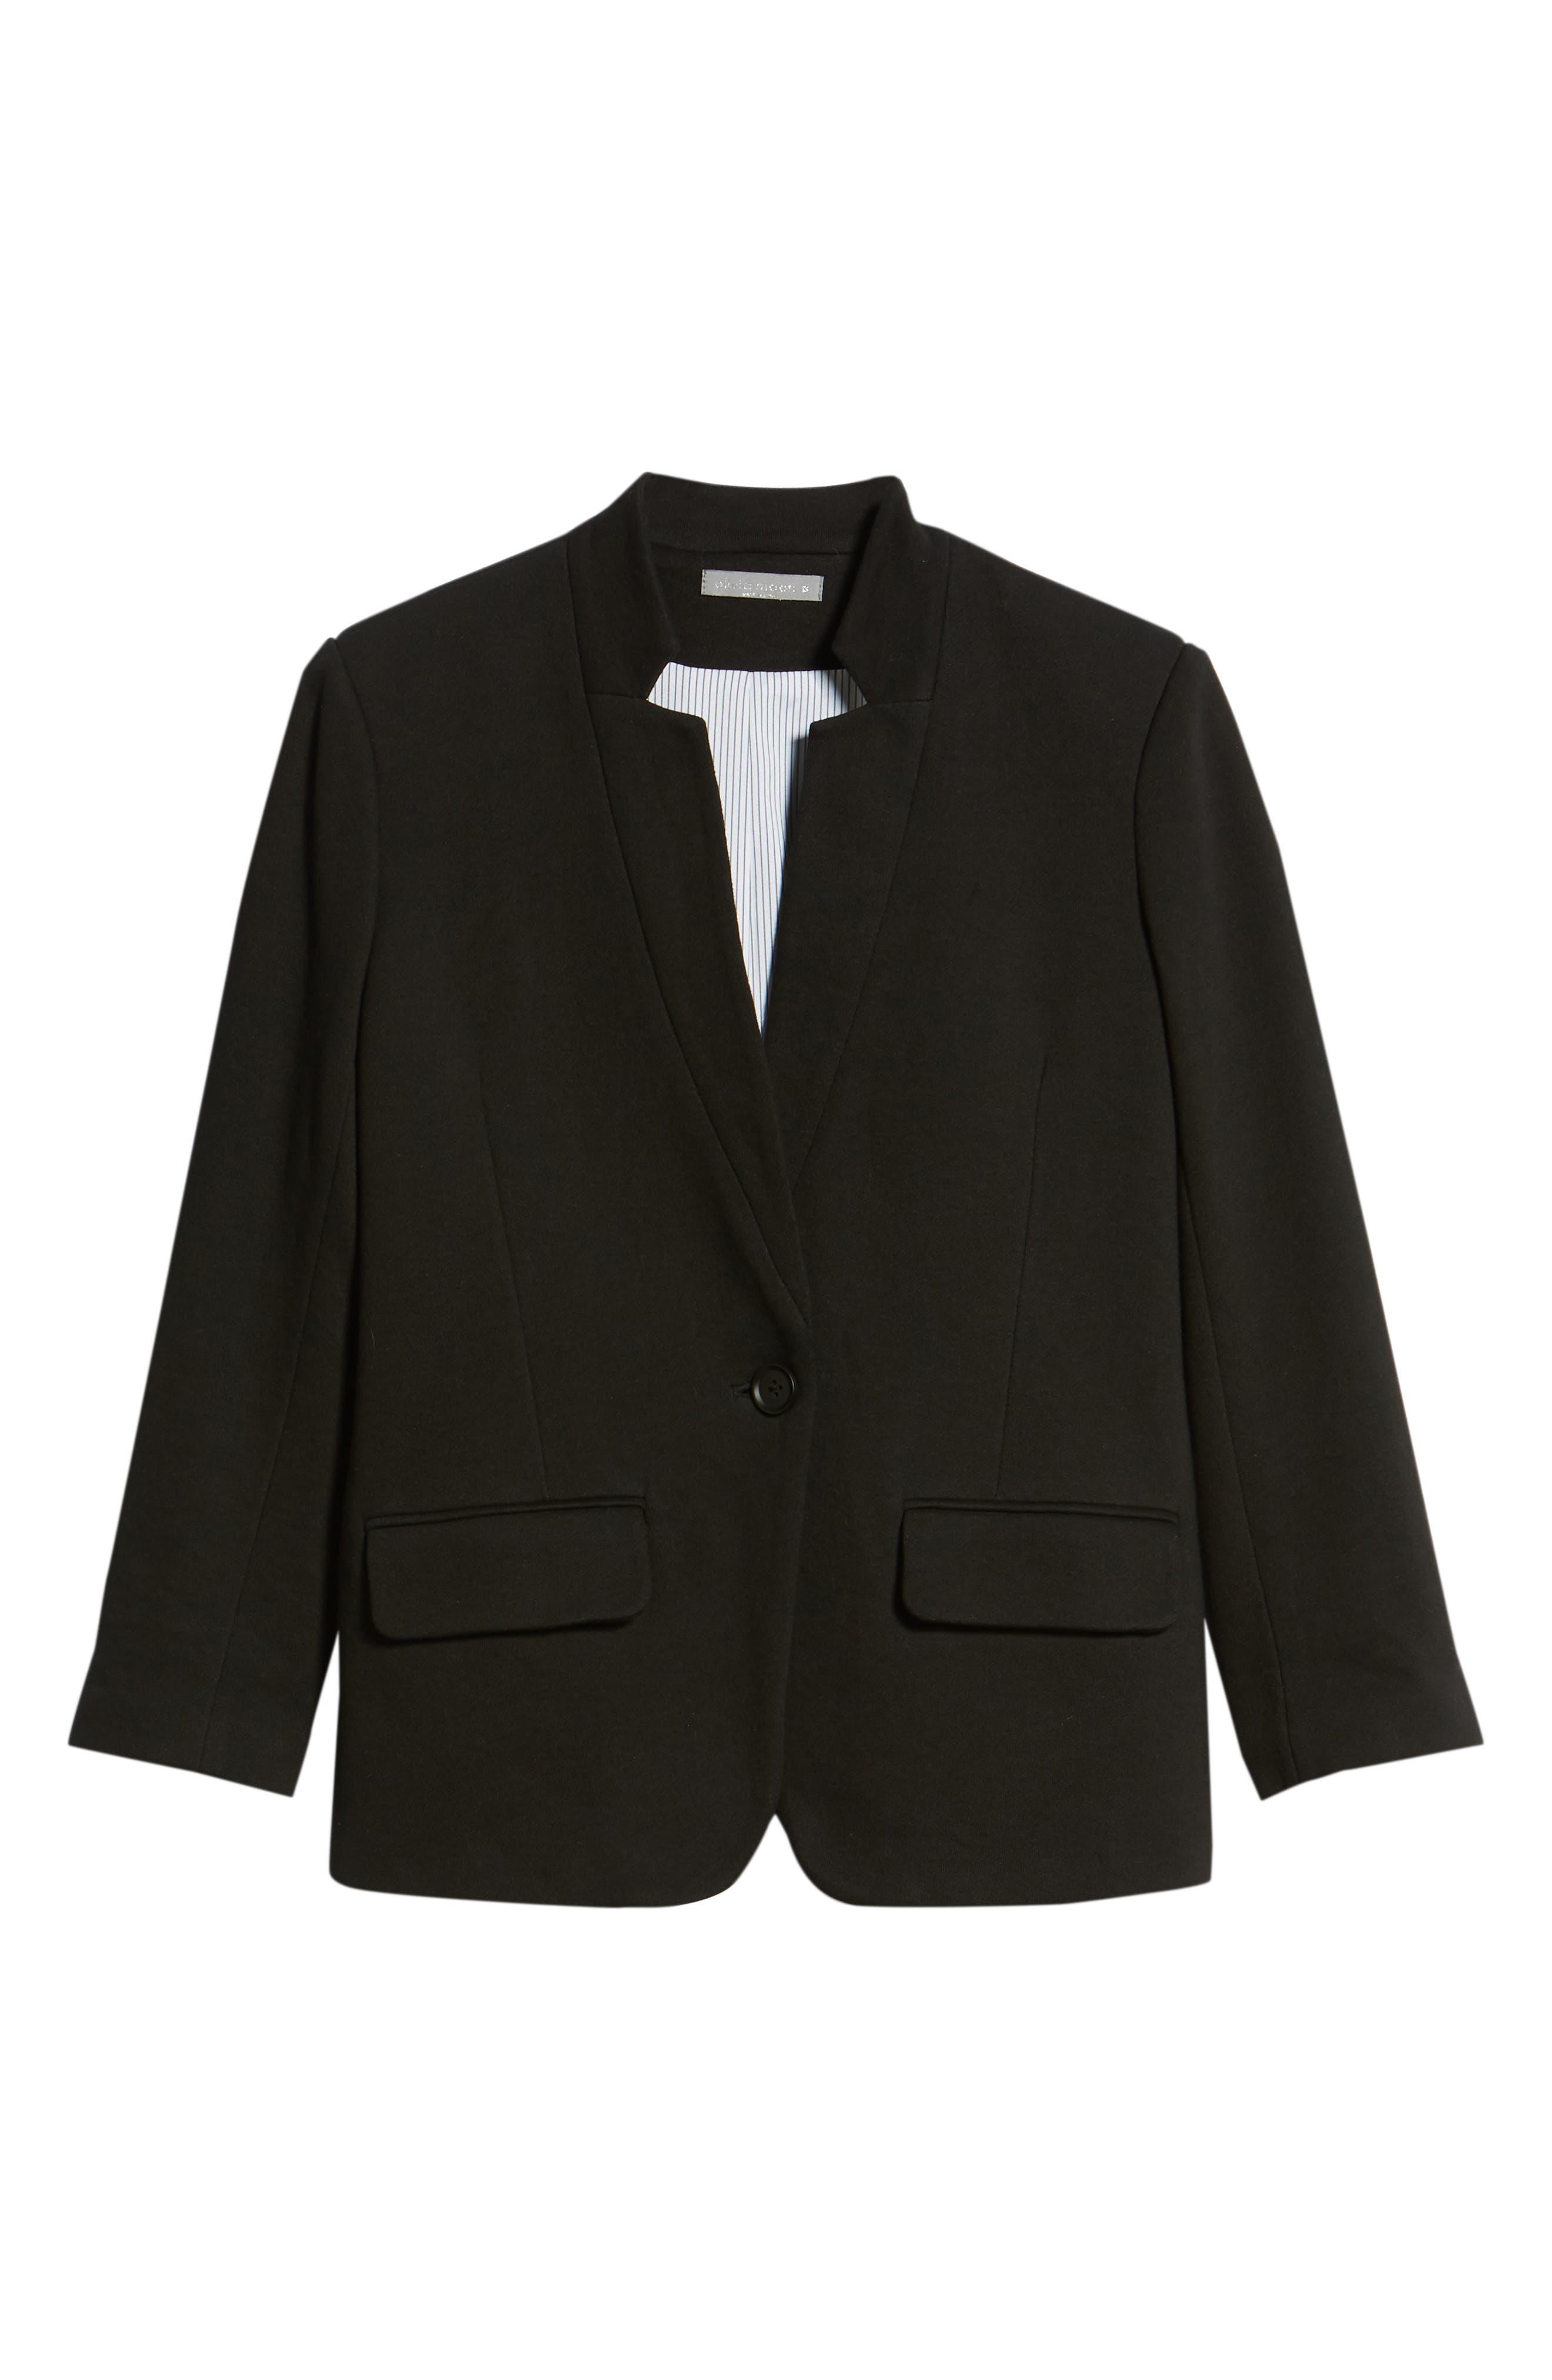 Cotton Blend Knit Blazer,                             Alternate thumbnail 6, color,                             Black